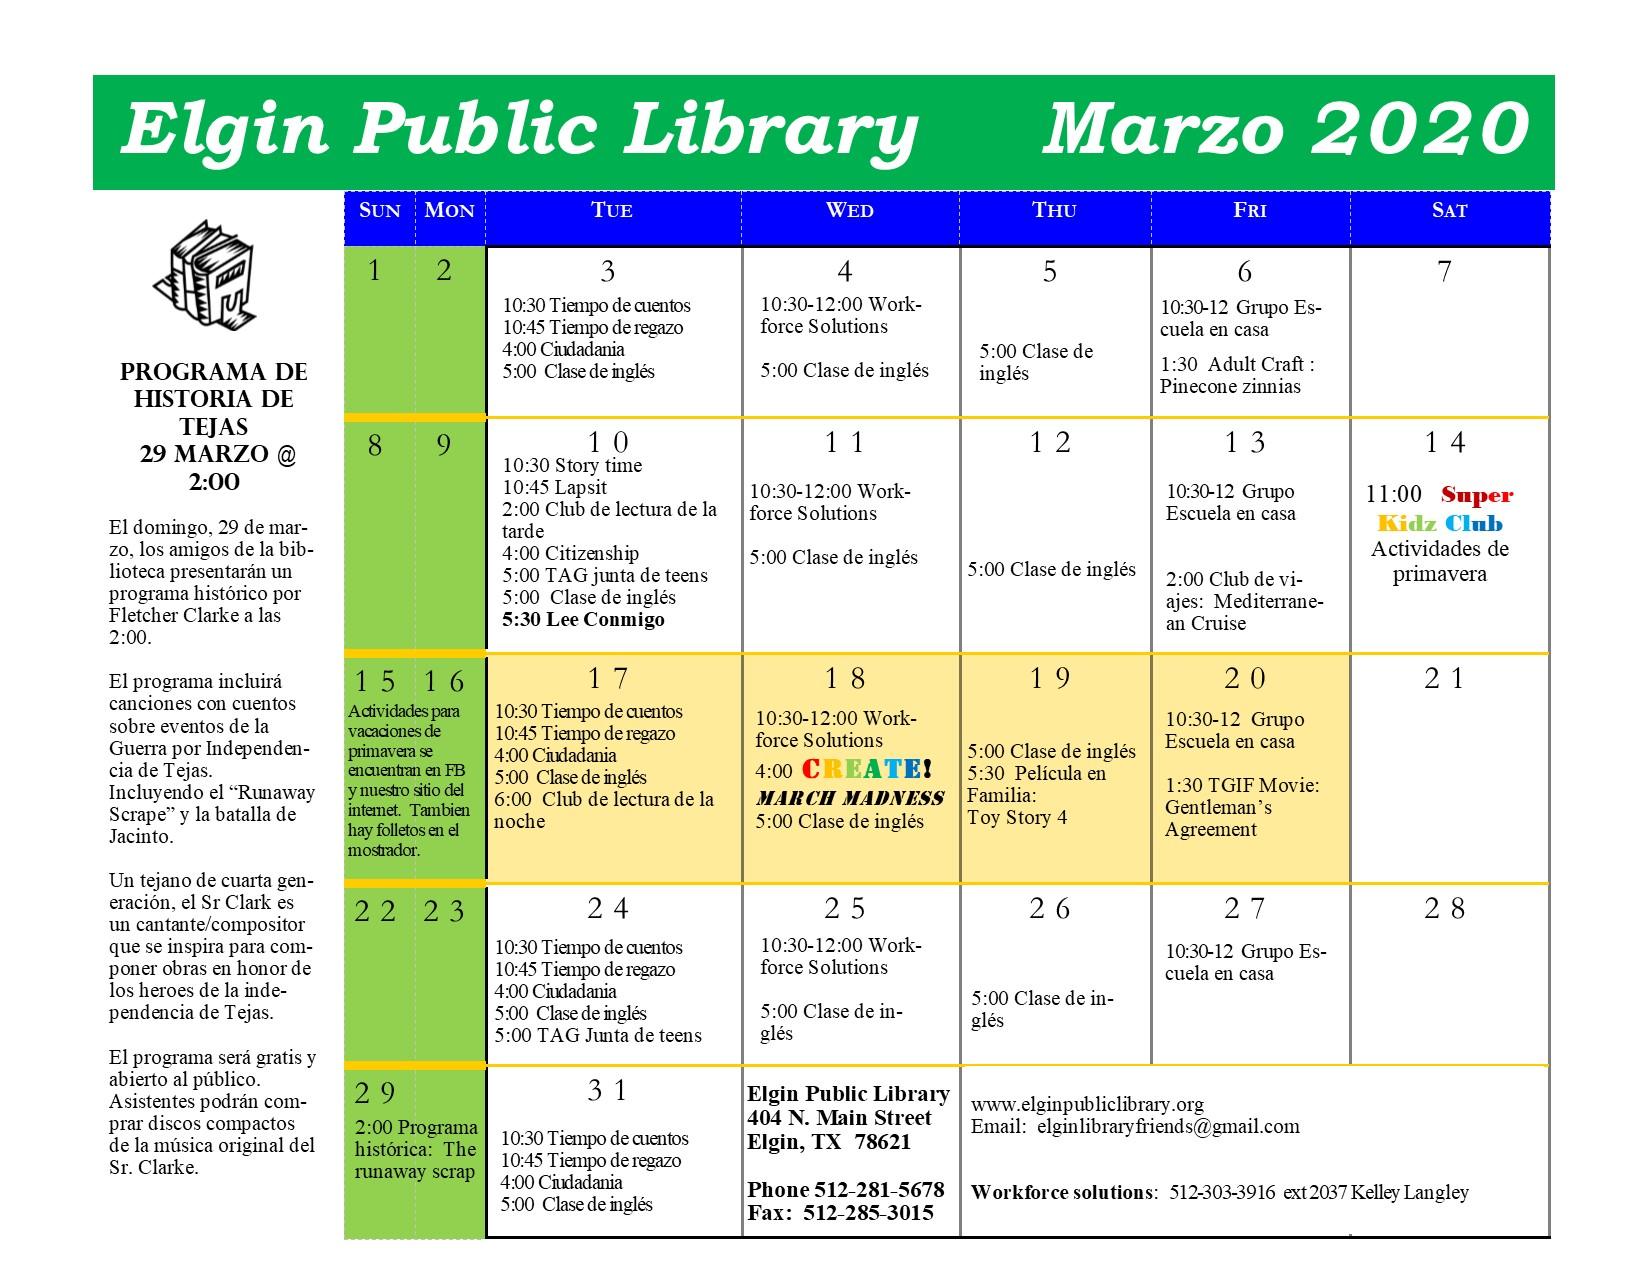 EPL Mar 2020 Calendar.jpg